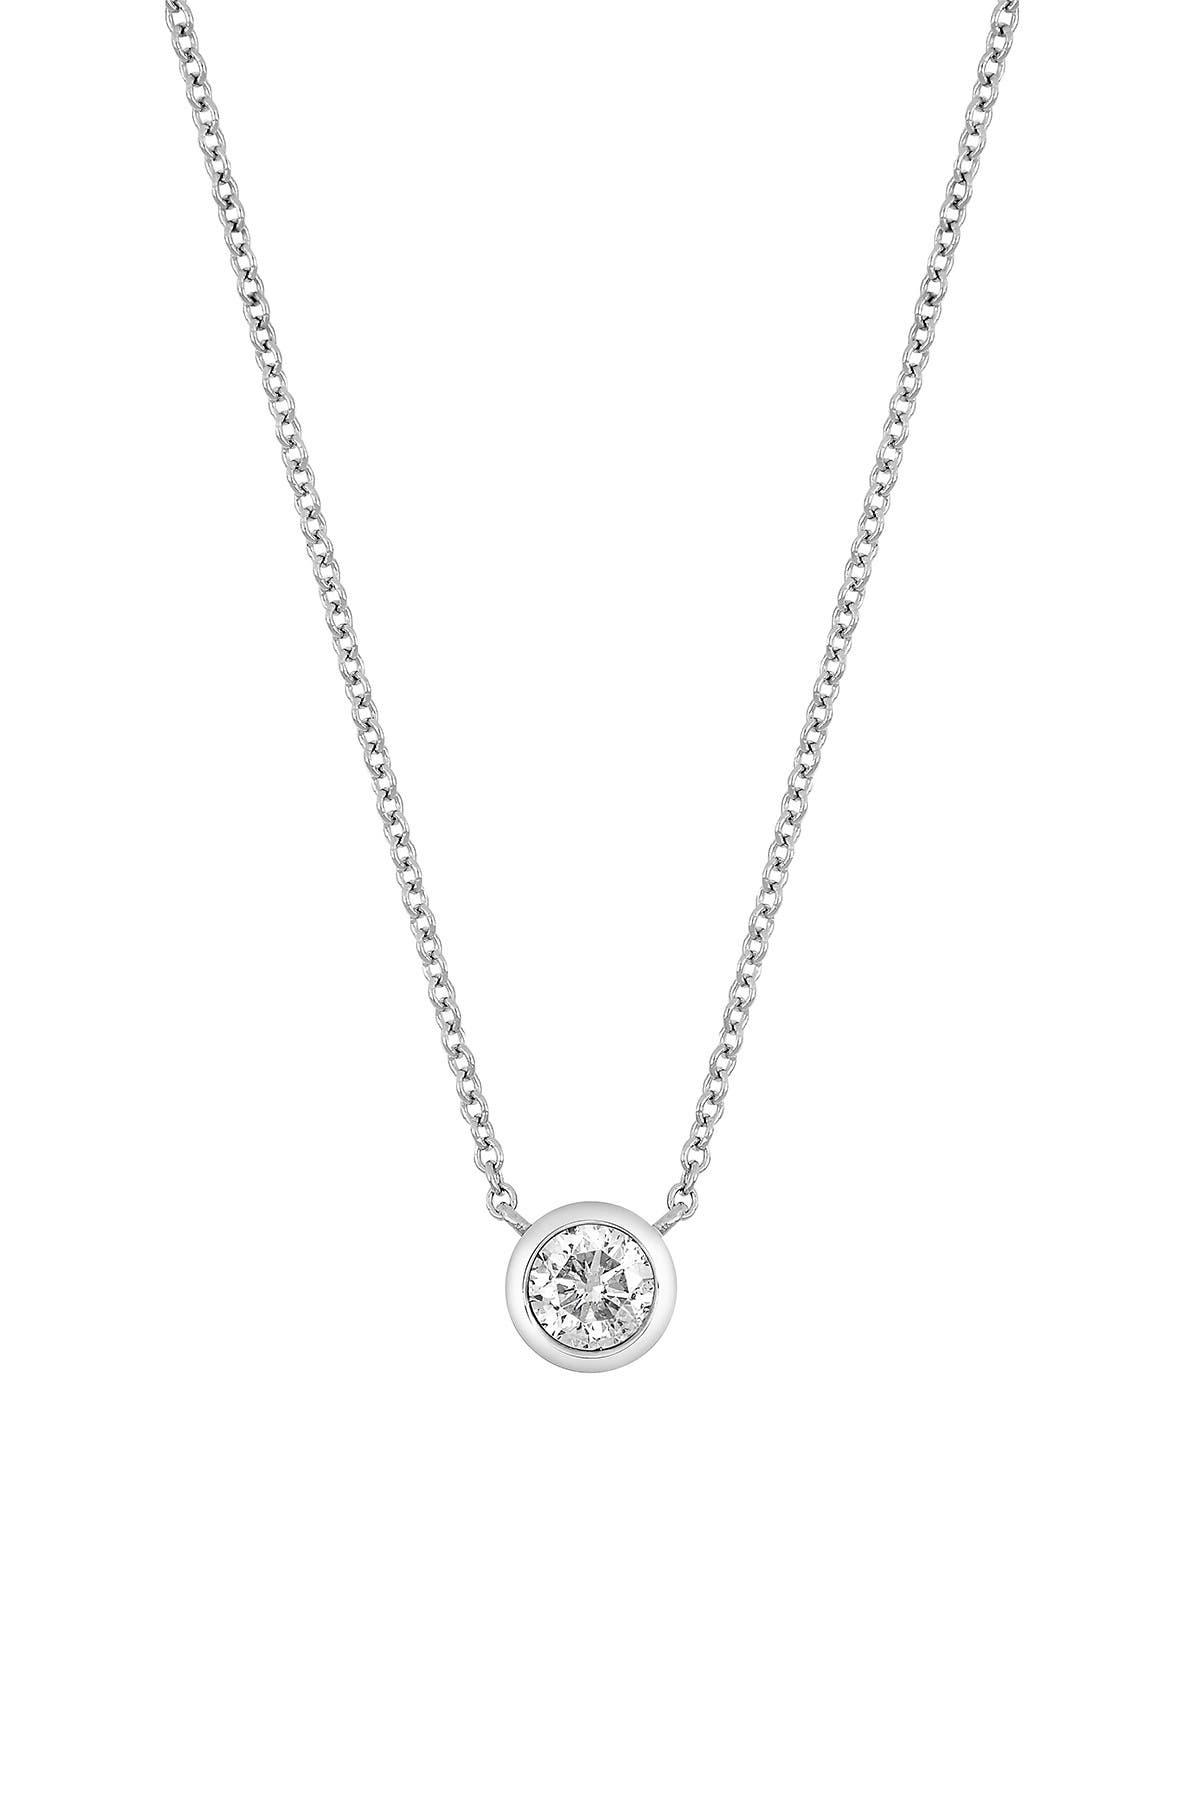 Image of Bony Levy 14K White Gold Bezel Set Diamond Solitaire Pendant Necklace - 0.25 ctw